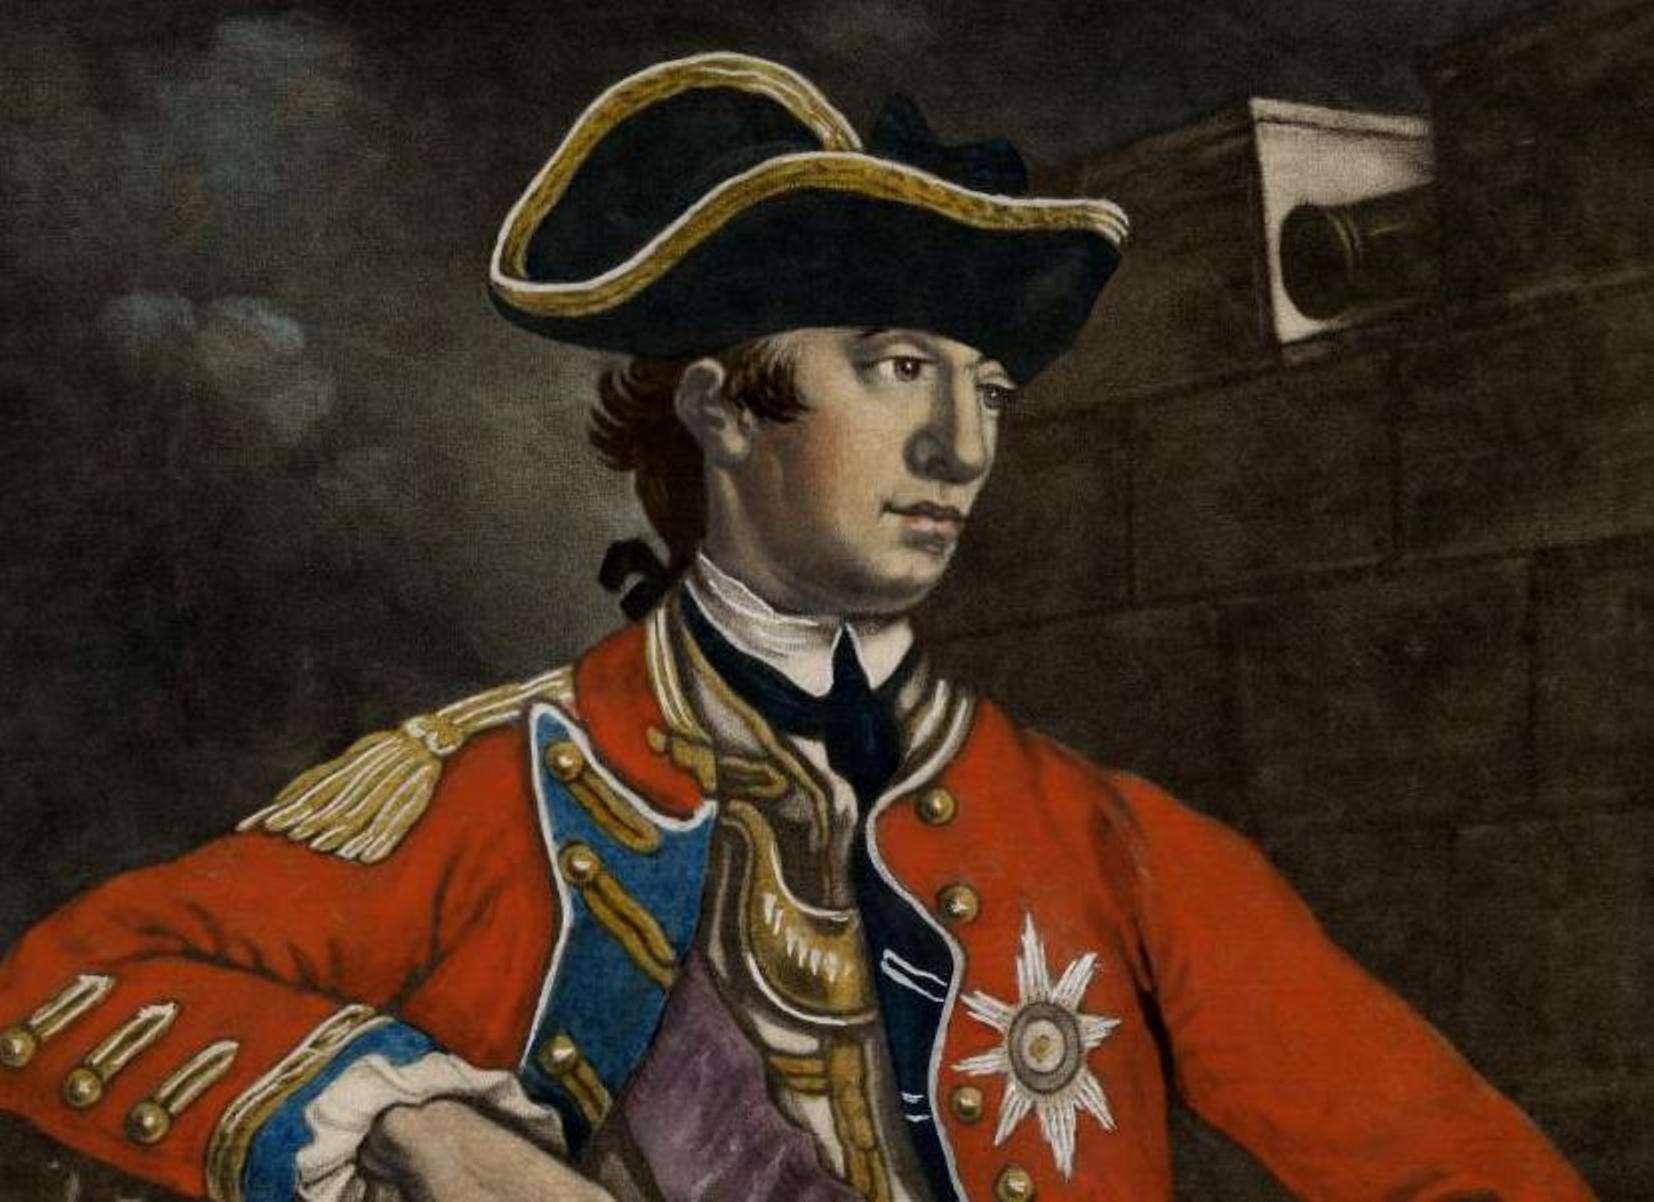 General William Howe in a red British Army uniform.